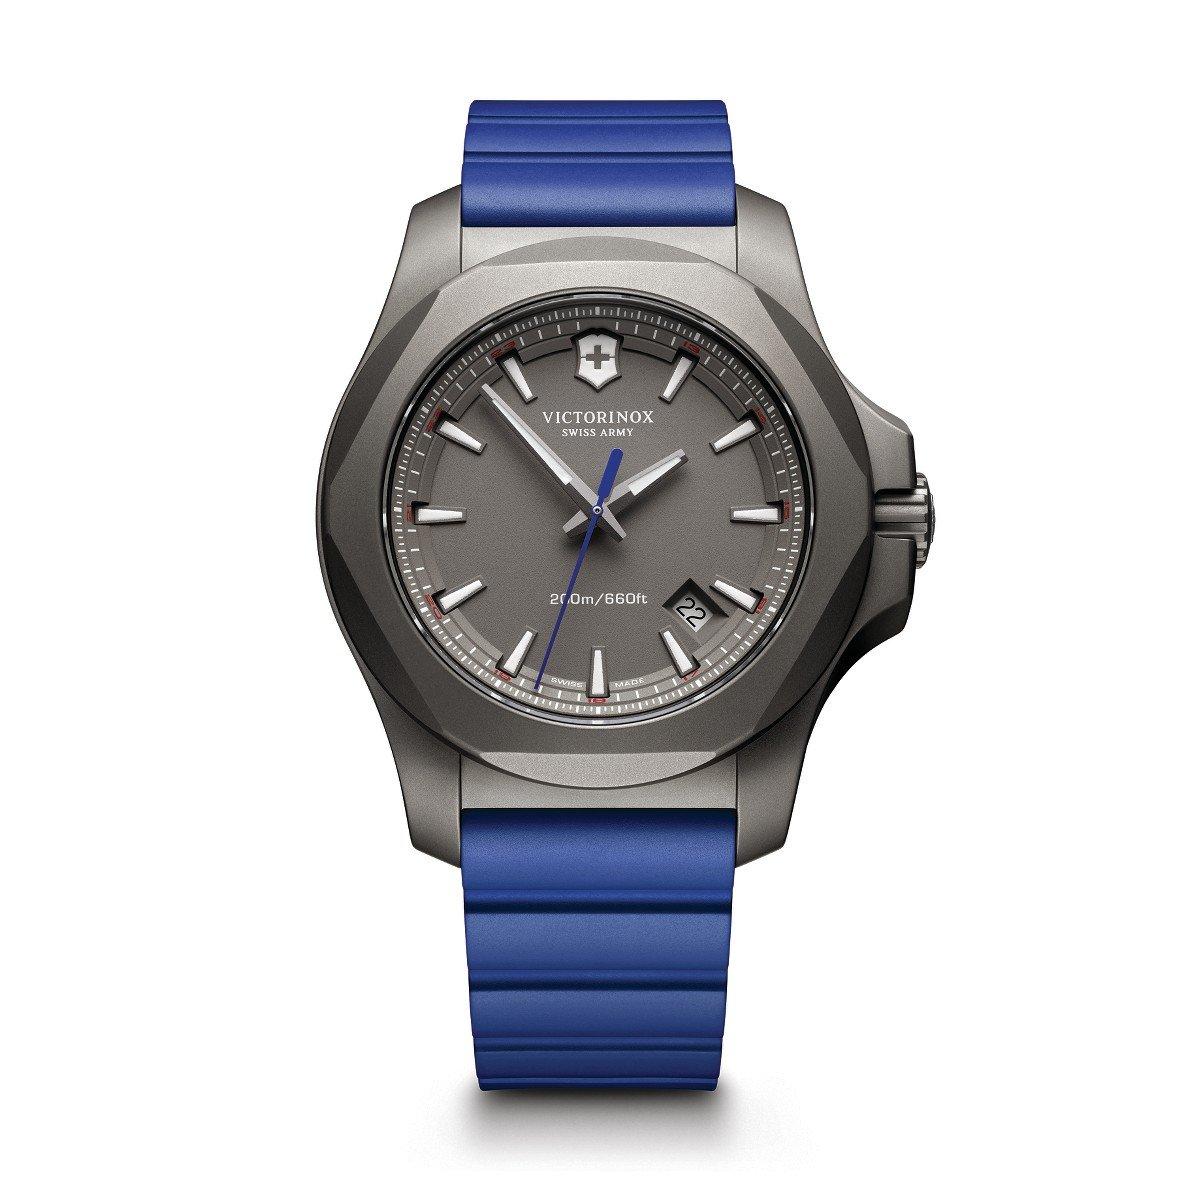 Victorinox Swiss Army i.n.o.x. Watch Blue I.N.O.X. Titanium B01LWZ6N9R Blue I.N.O.X. Titanium|メンズ I.N.O.X. (Men's I.N.O.X.) Blue I.N.O.X. Titanium